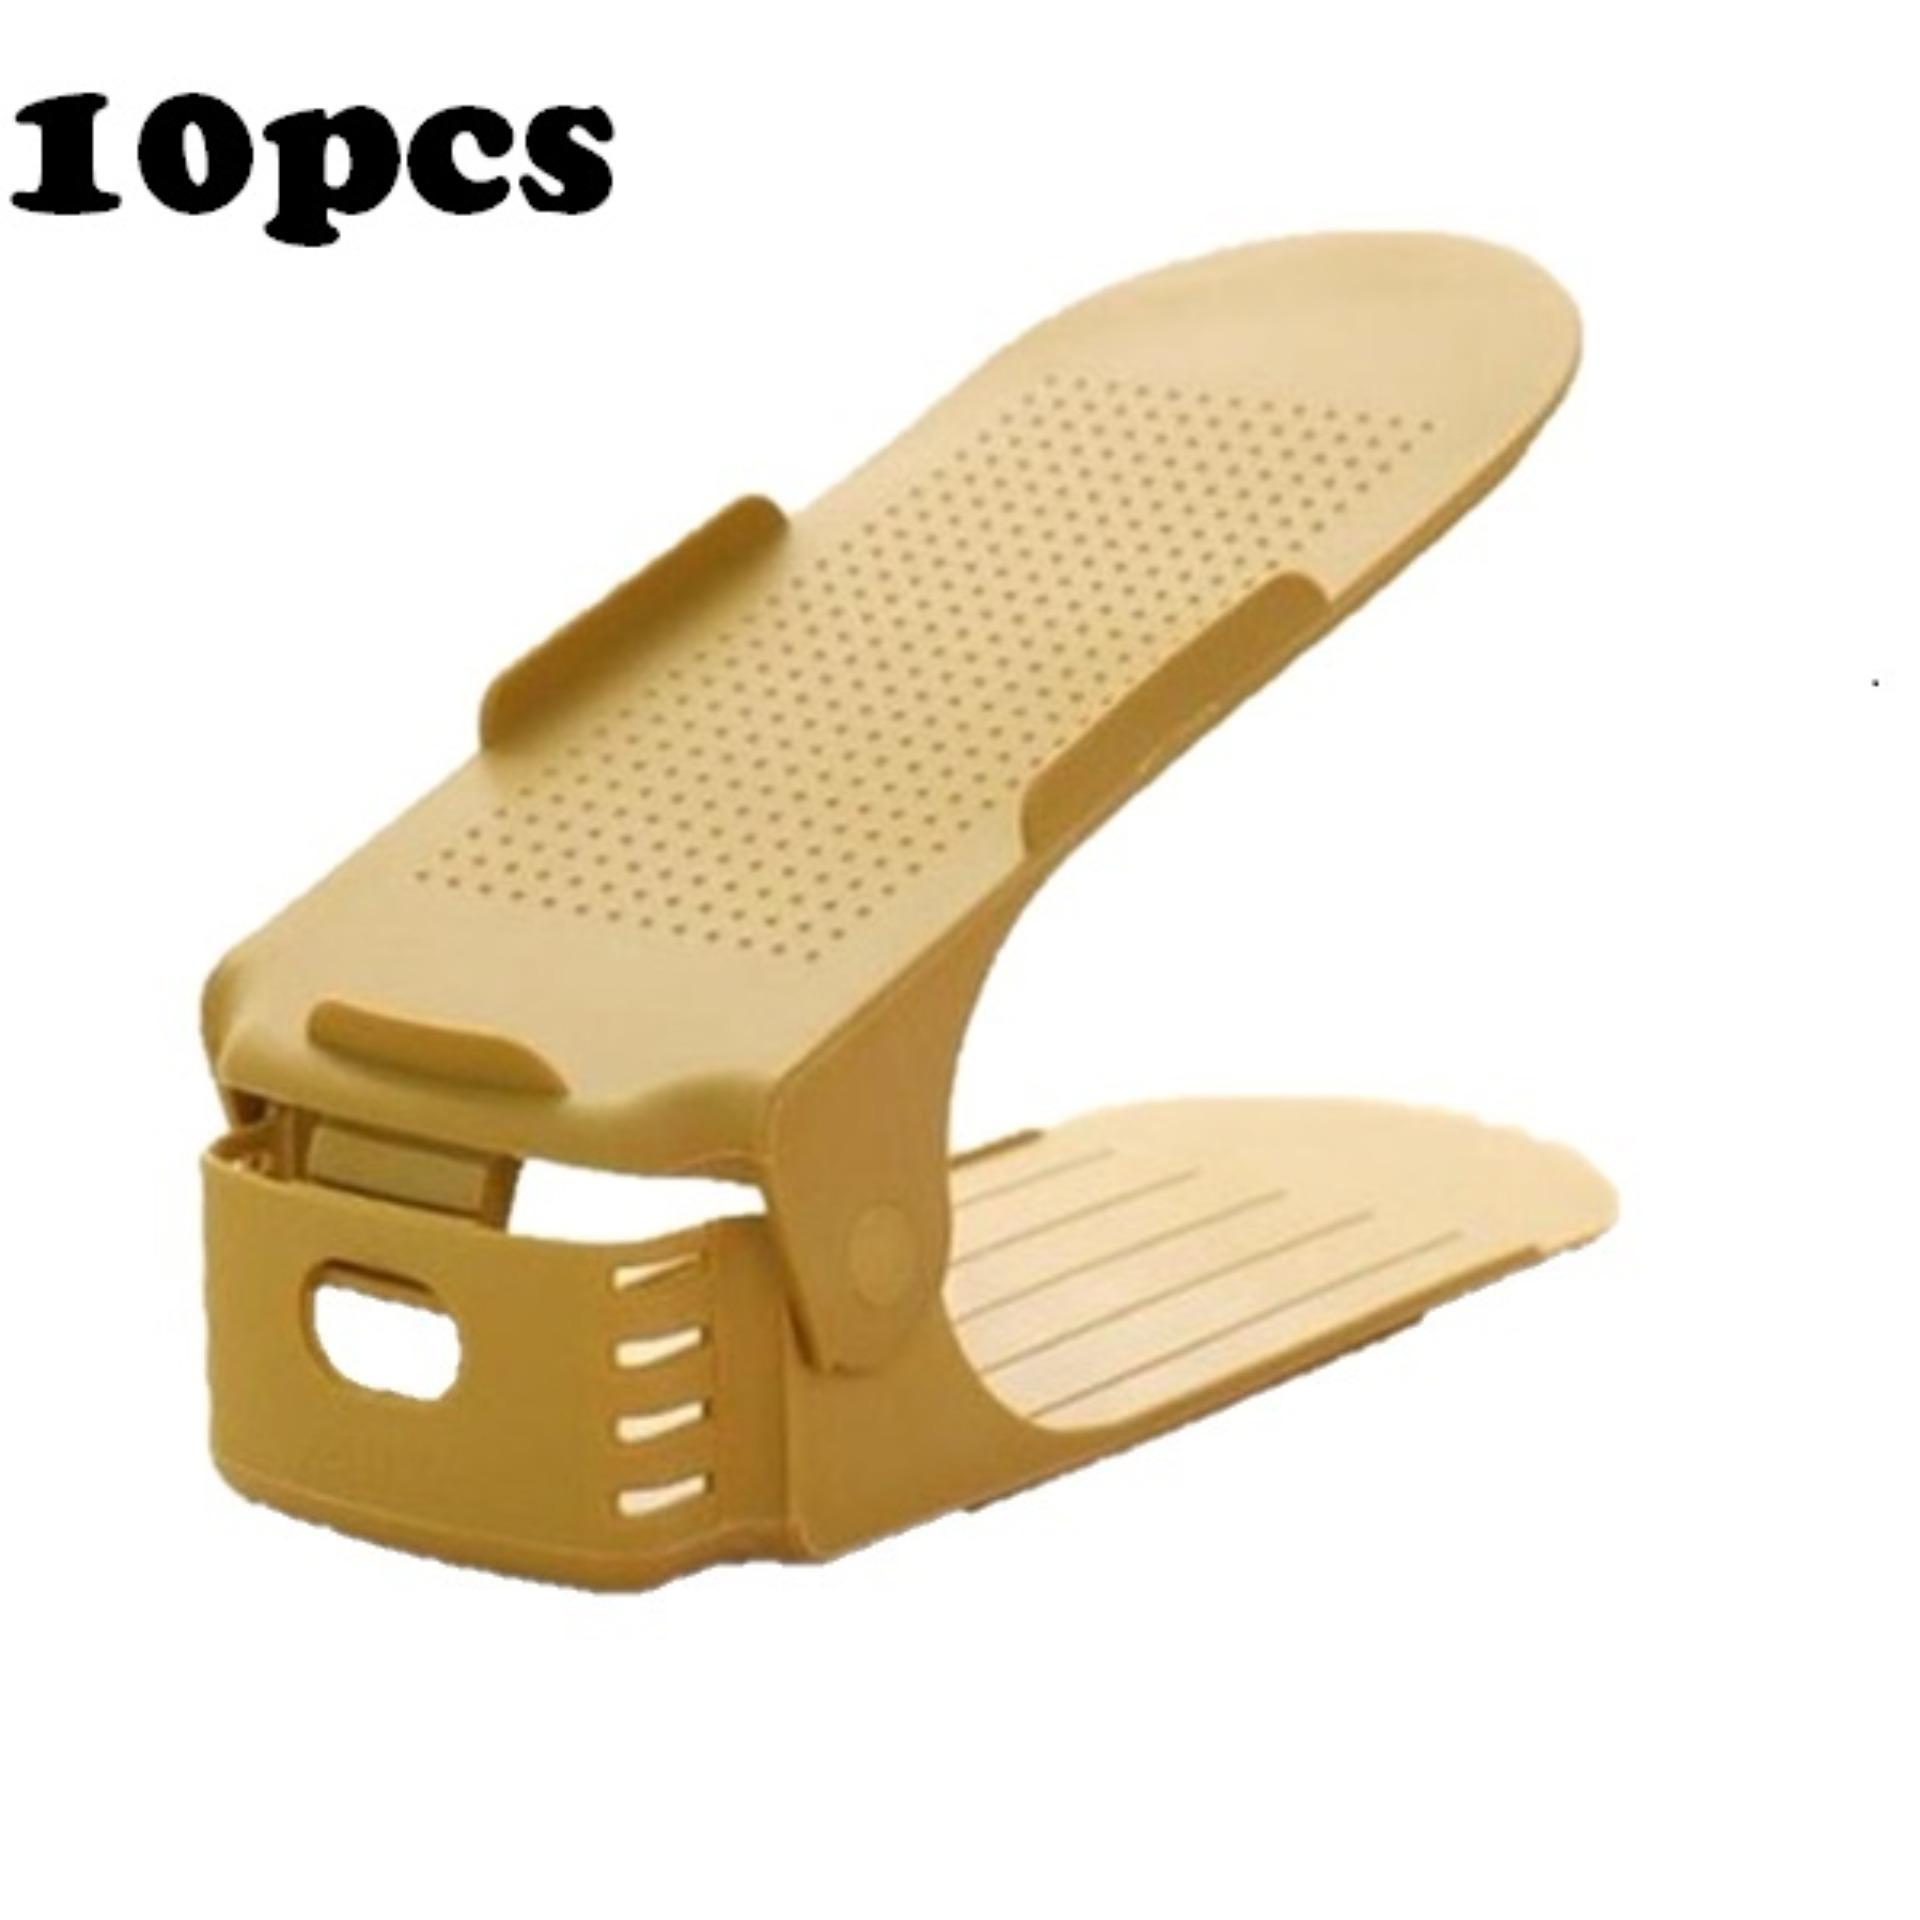 Retail Price 10Pcs Creative High Heel Shoes Organizer Adjustable Shoes Racks Space Saving Plastic Storage Rack Khaki Intl